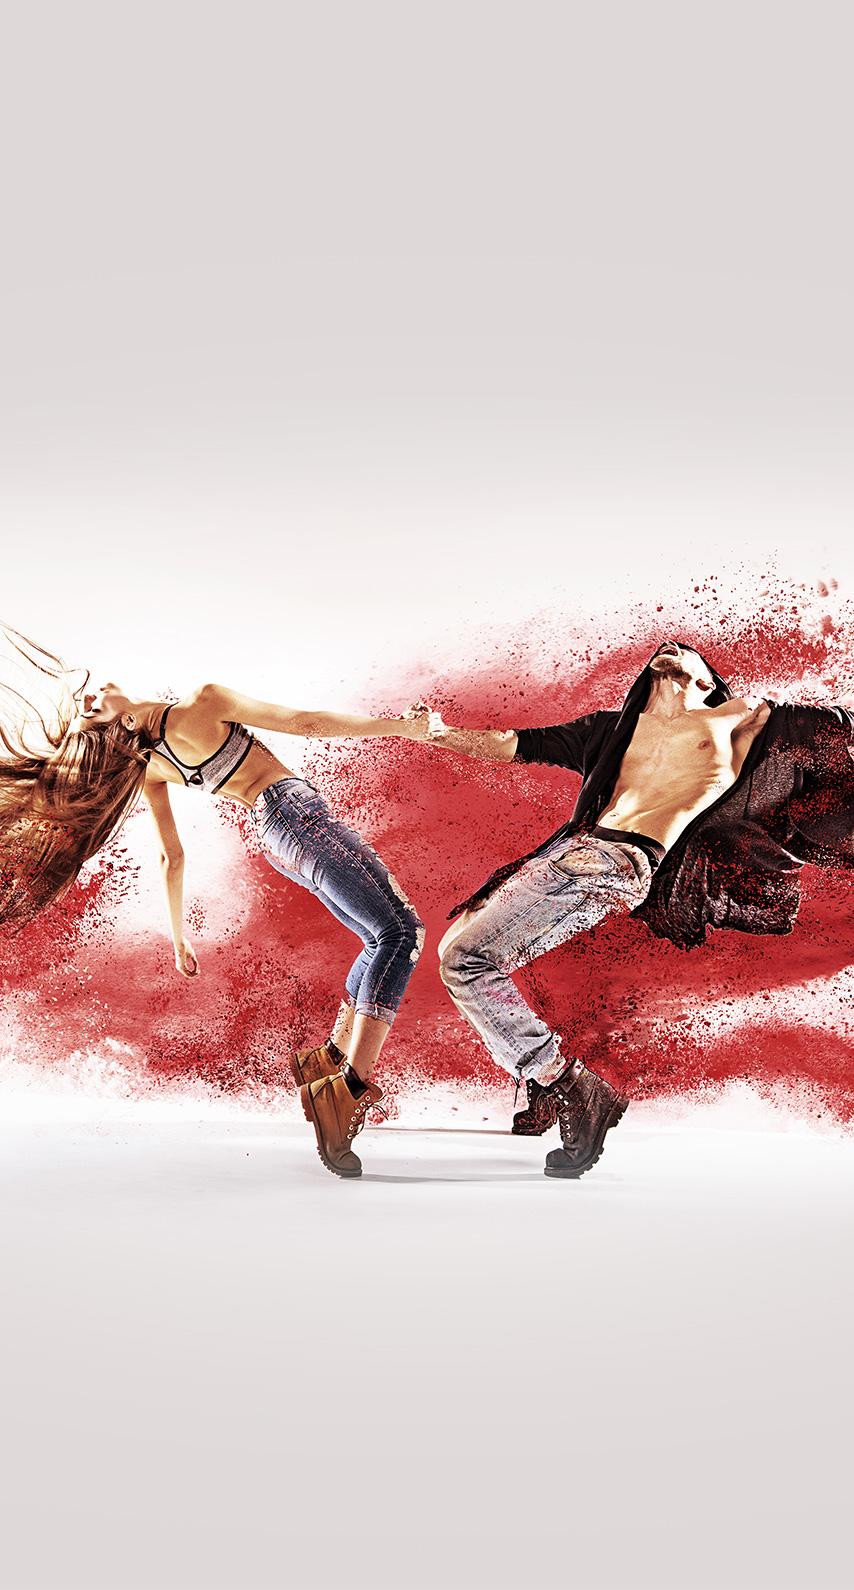 dancing, computer wallpaper